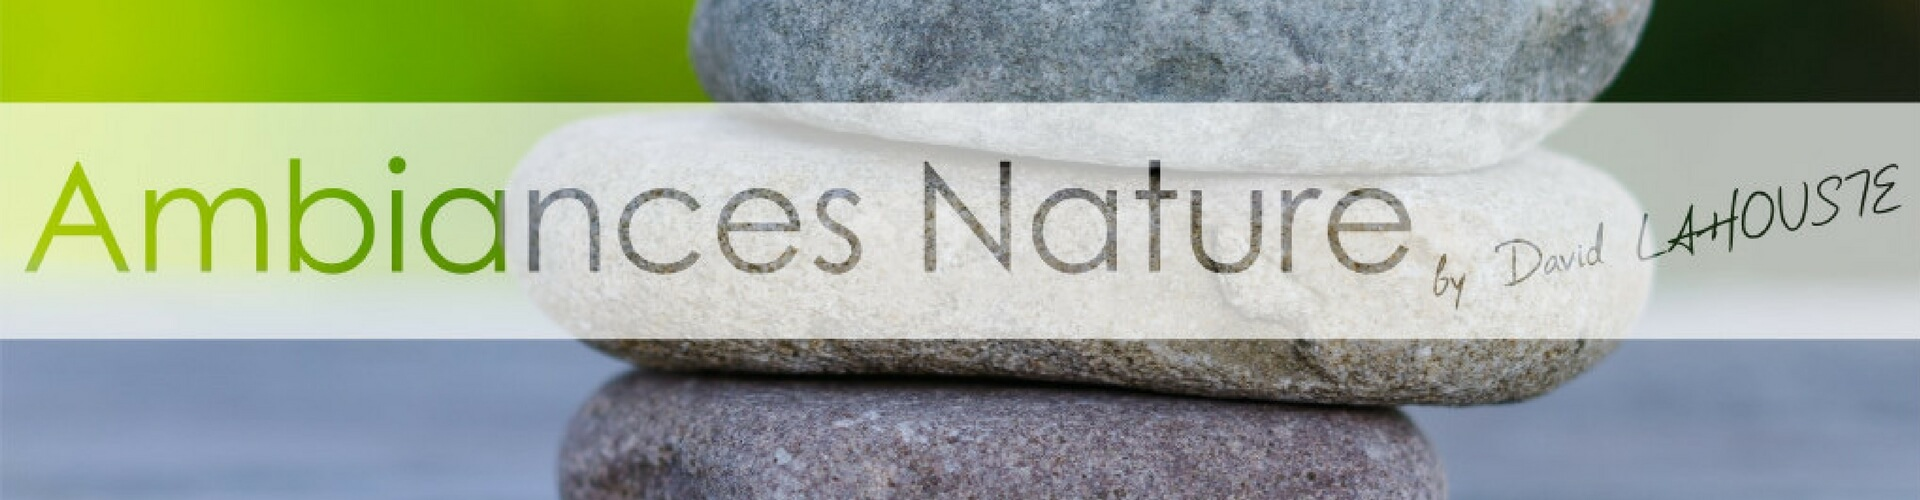 Ambiances Nature